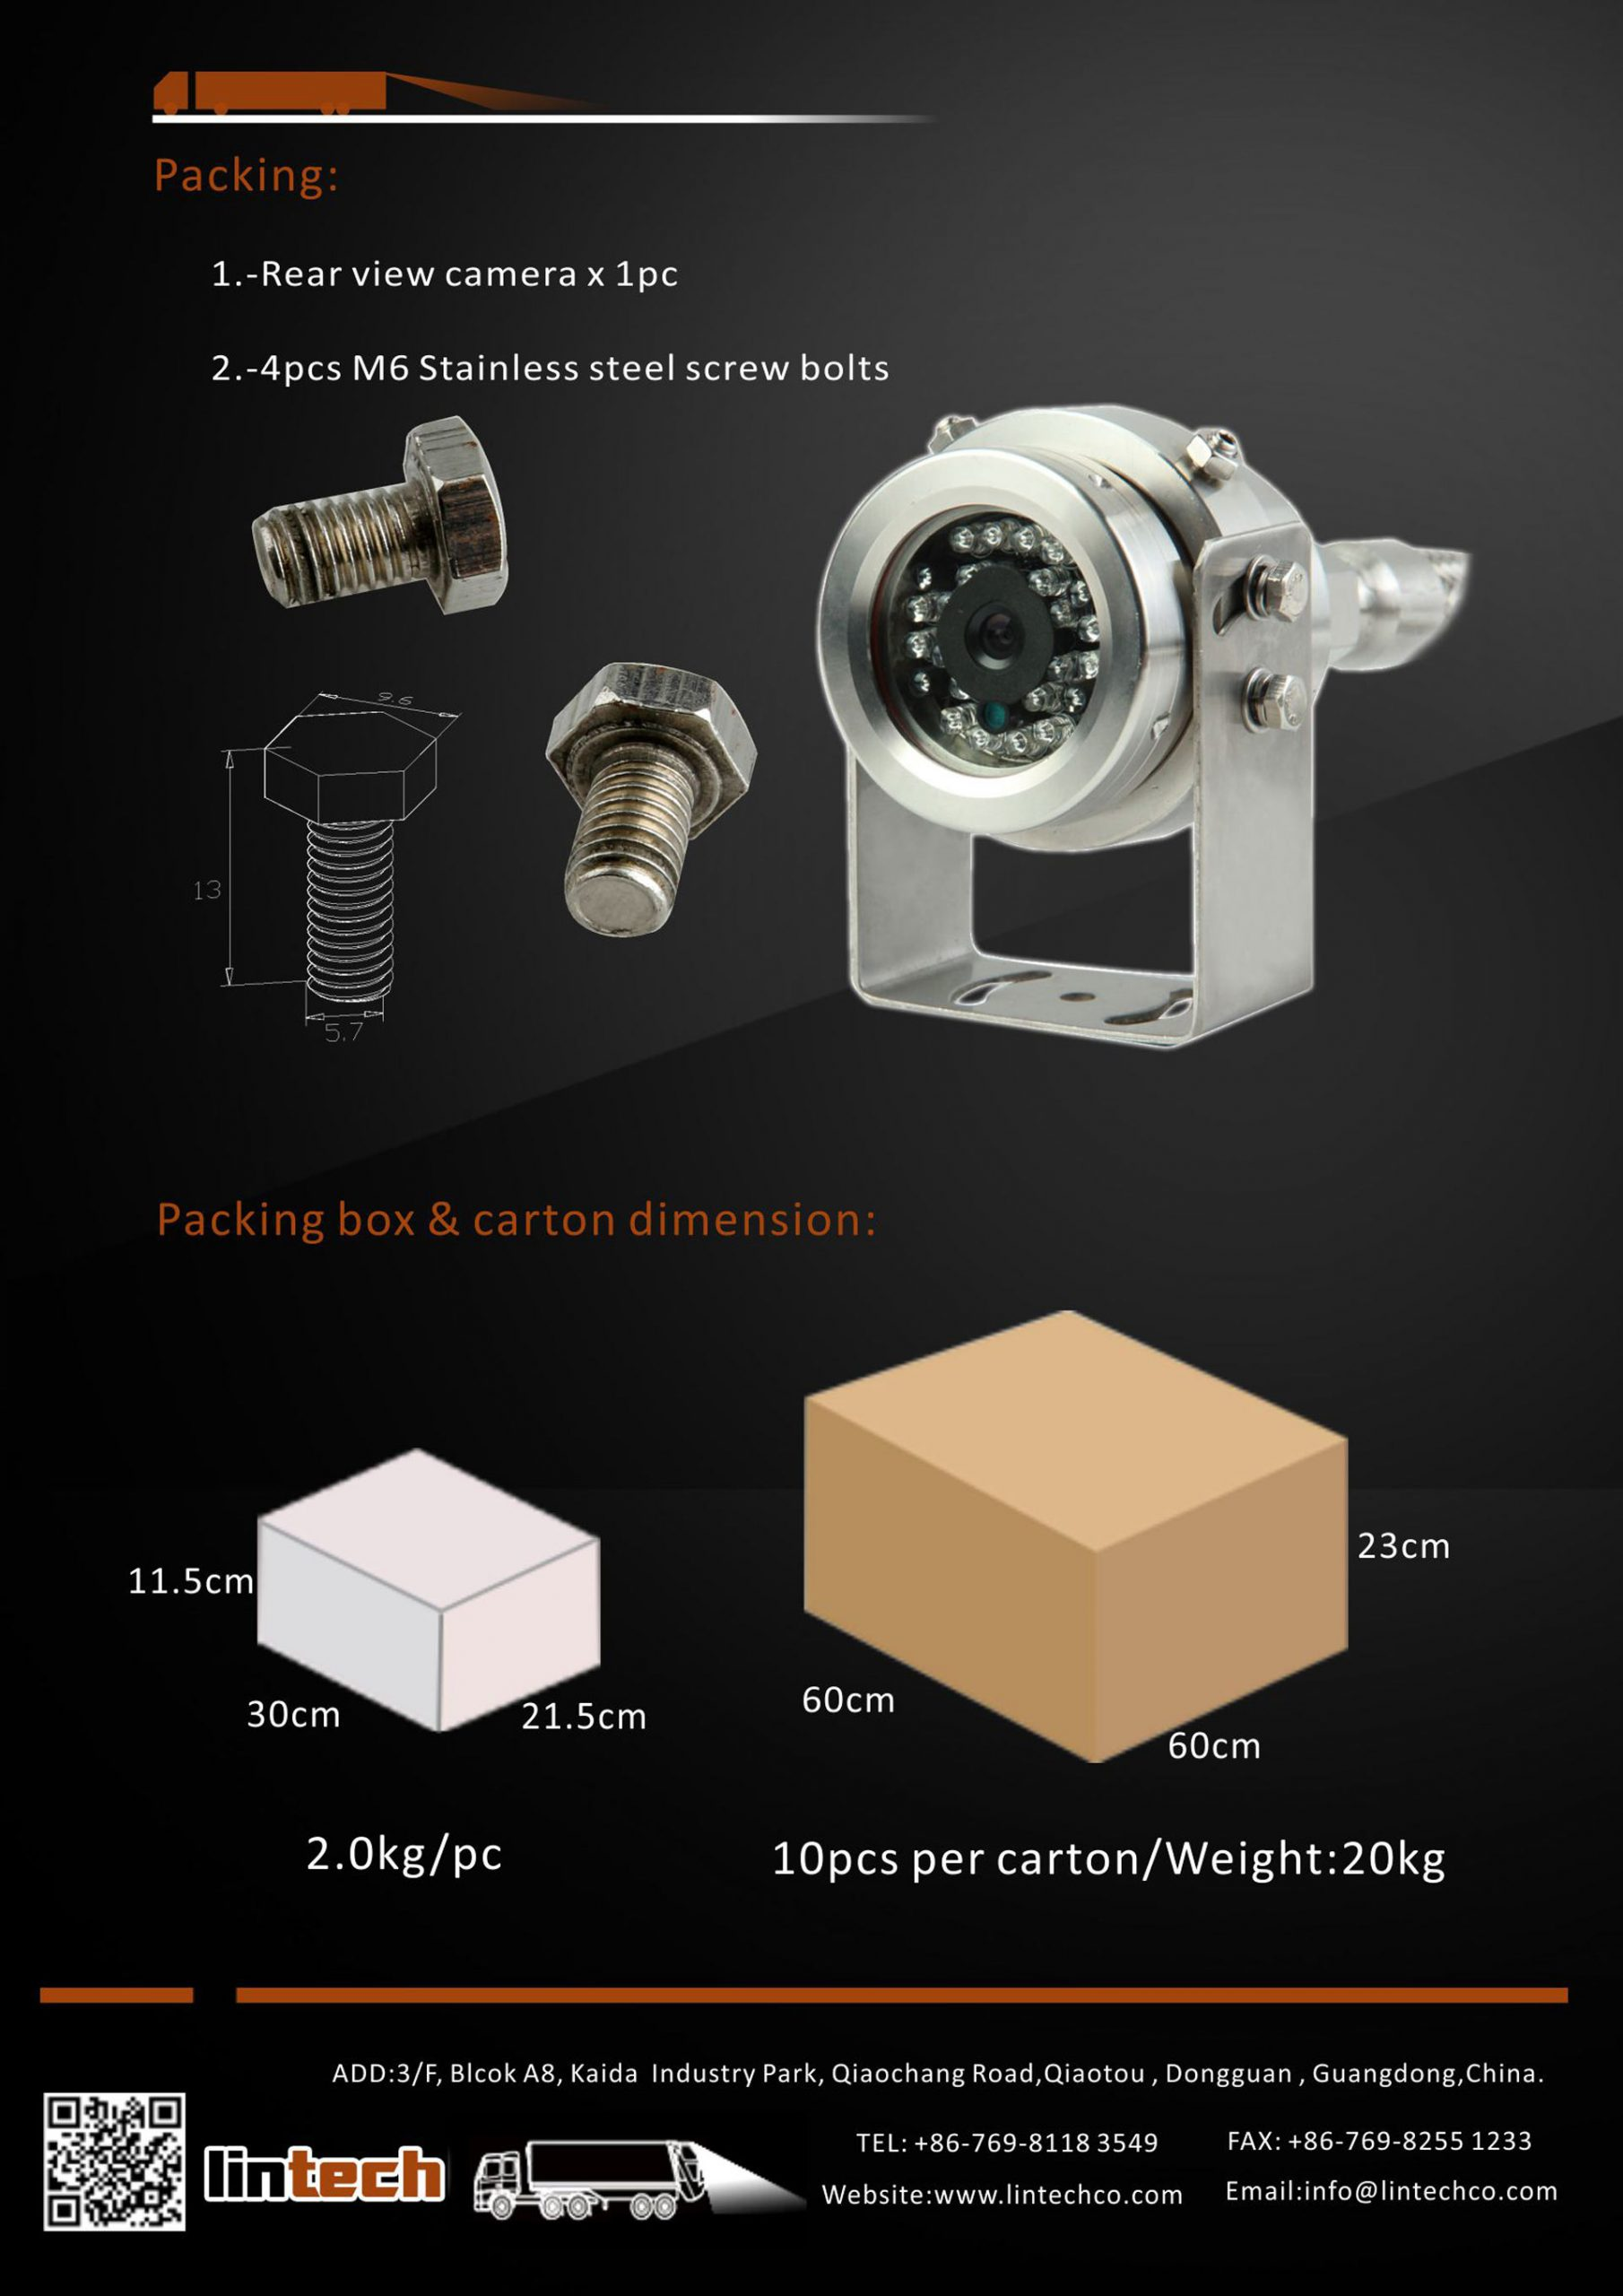 8.304 Stainless Steel Waterproof Explosion-proof Rear View Camera